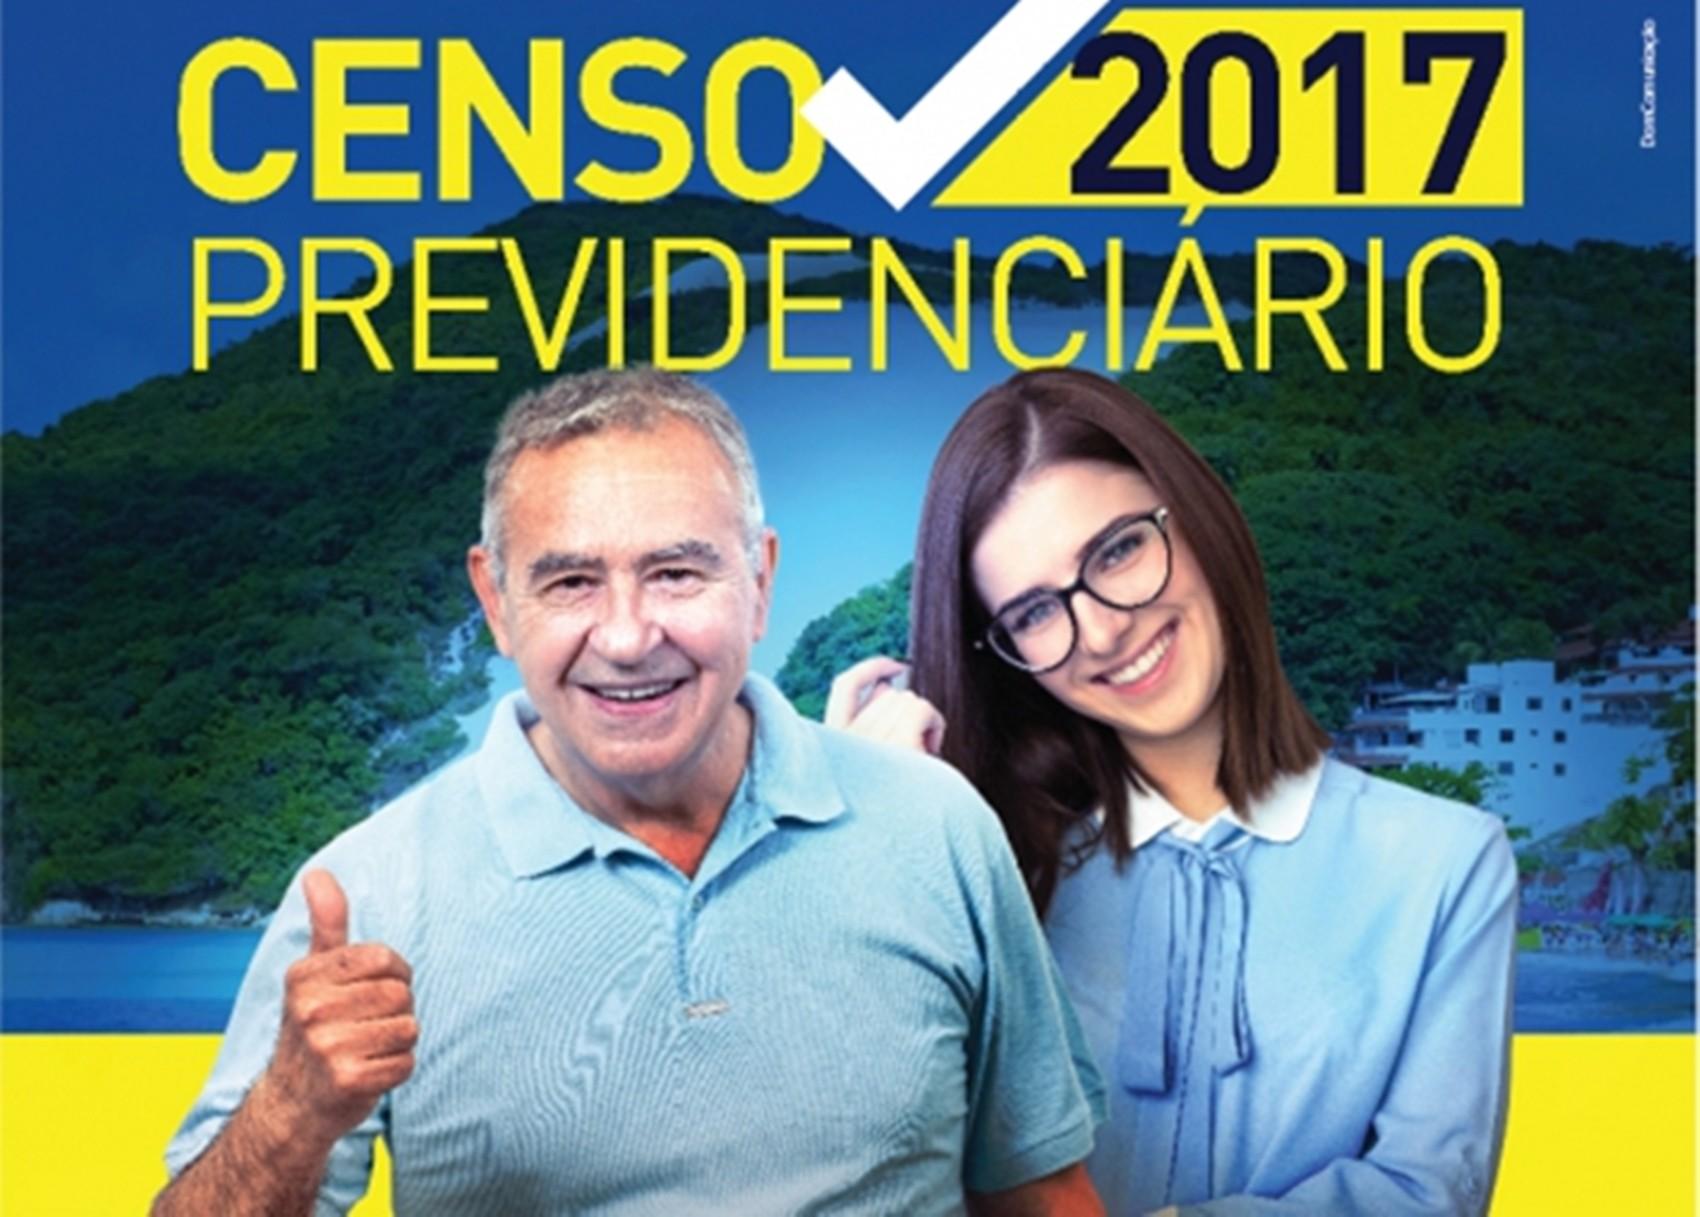 Prefeitura realiza censo previdenciário